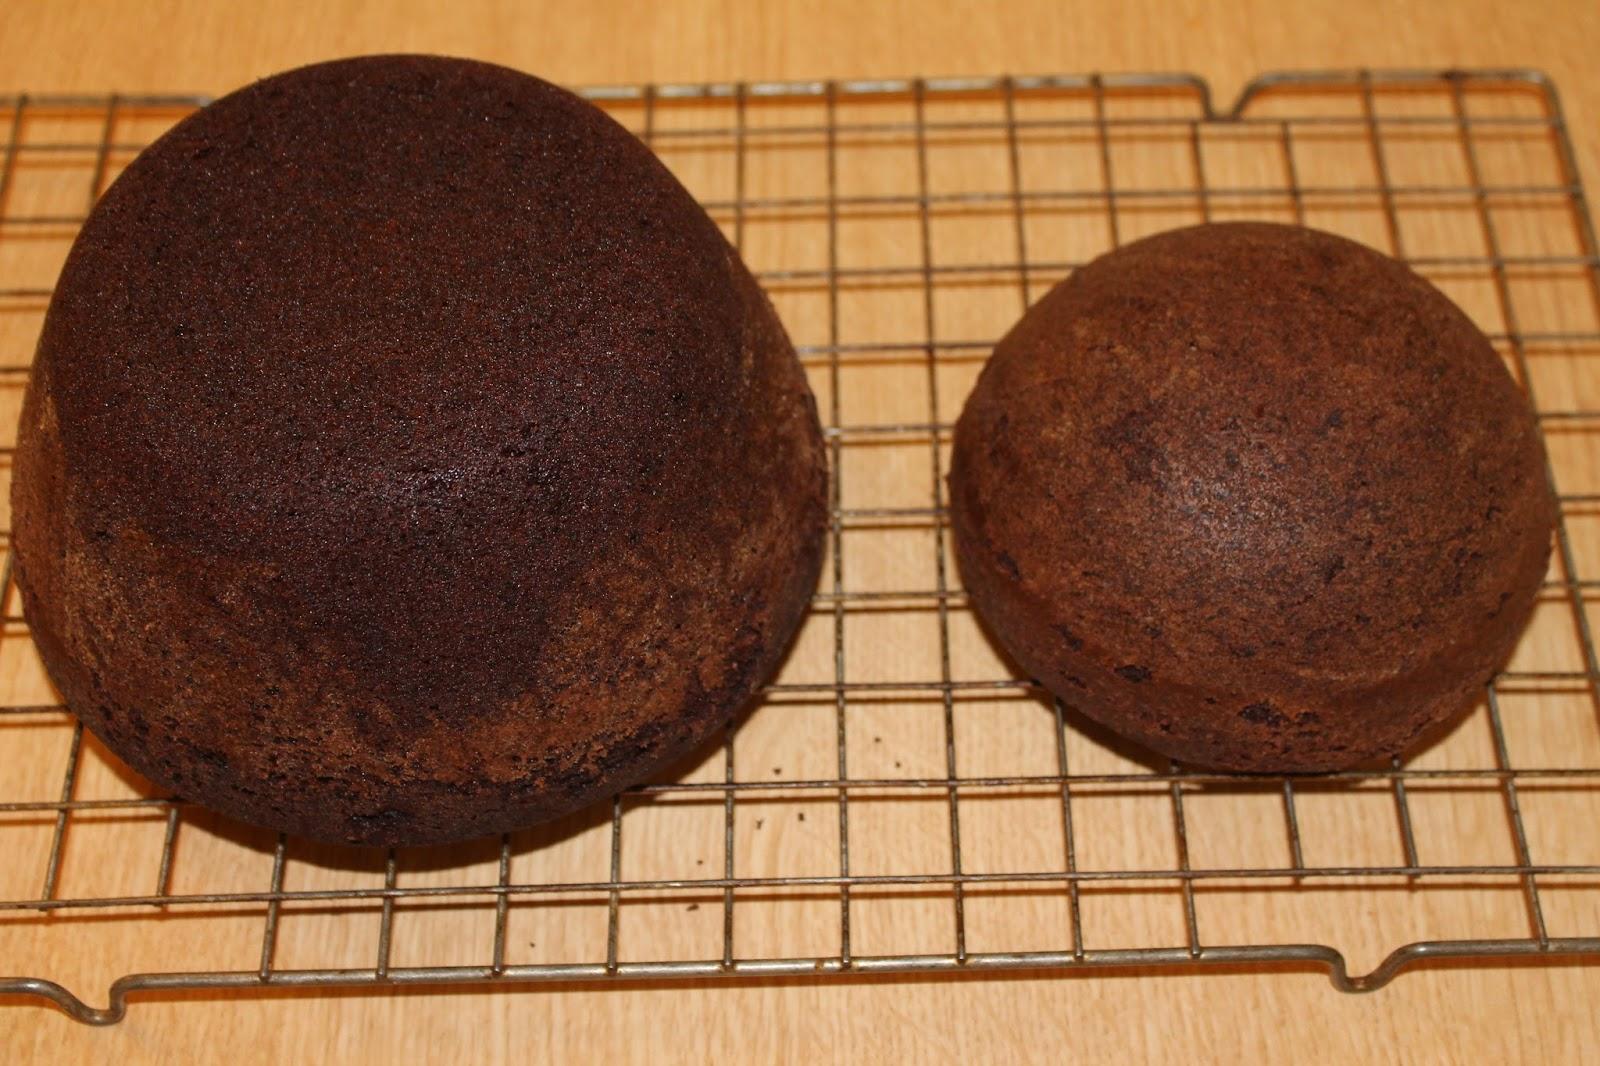 Hemisphere Cake Pan Batter Amount